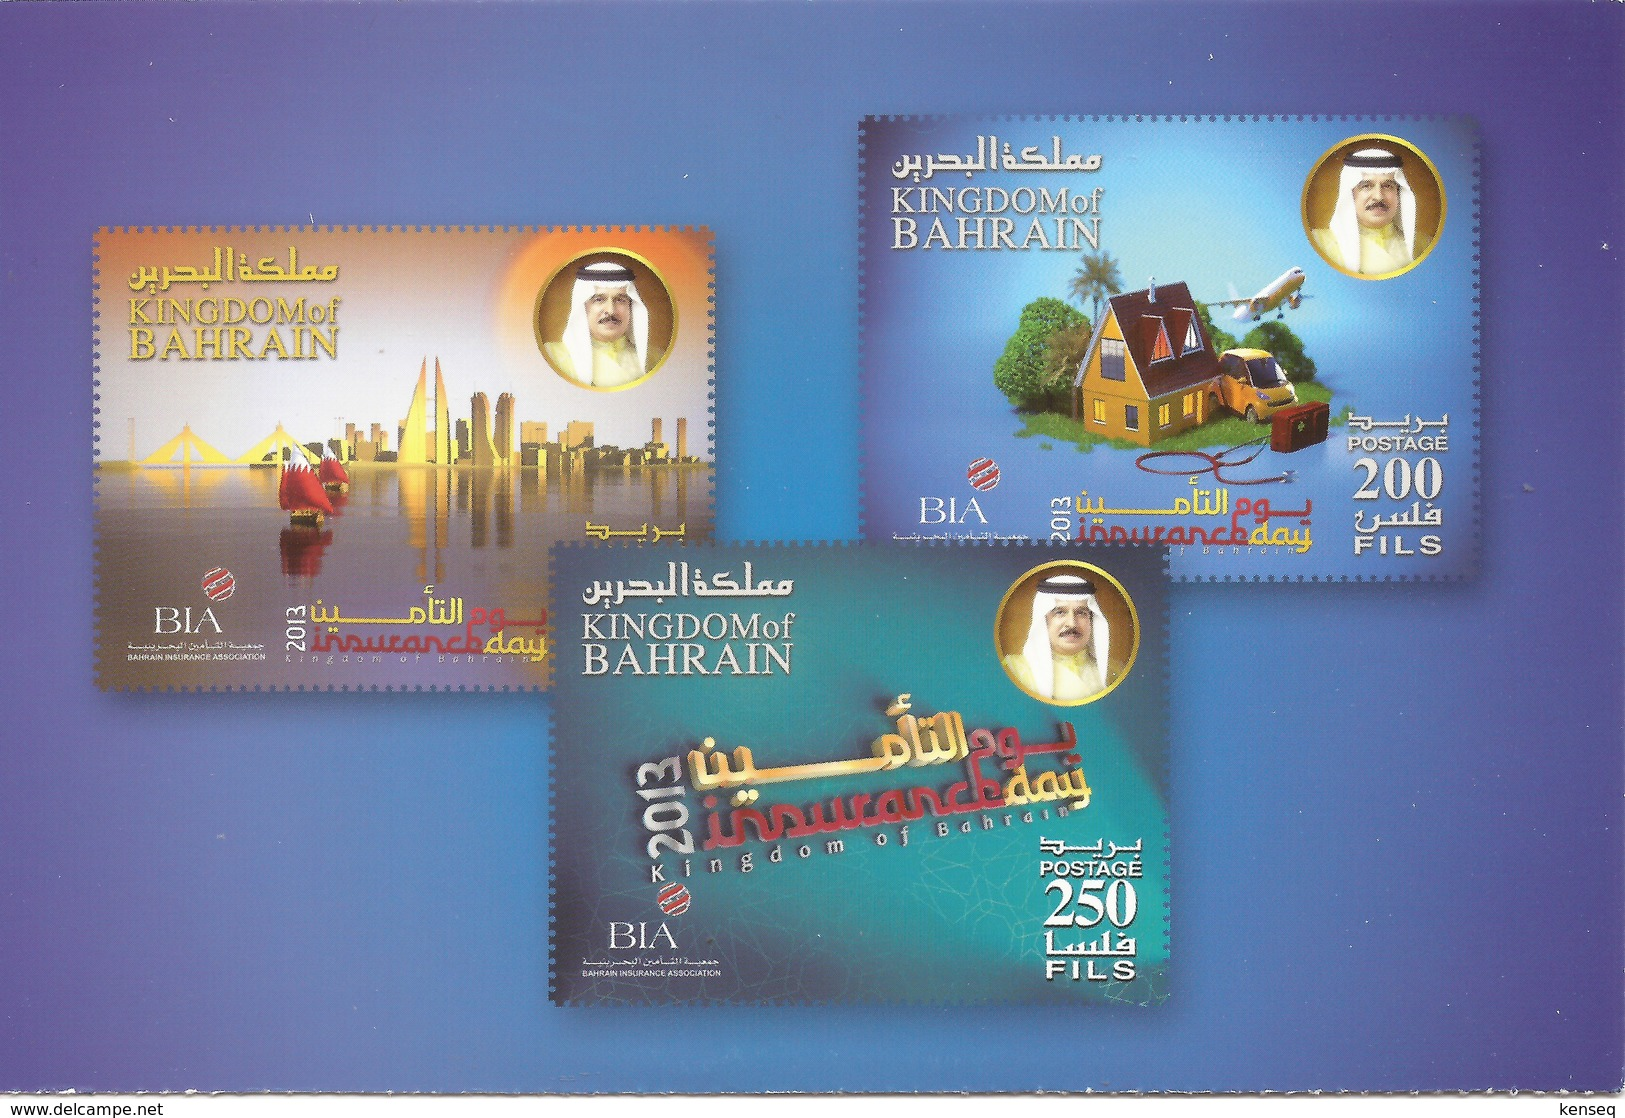 Bahrain 2013 - Bahrain Insurance Association - Mint Postcard - Bahrain